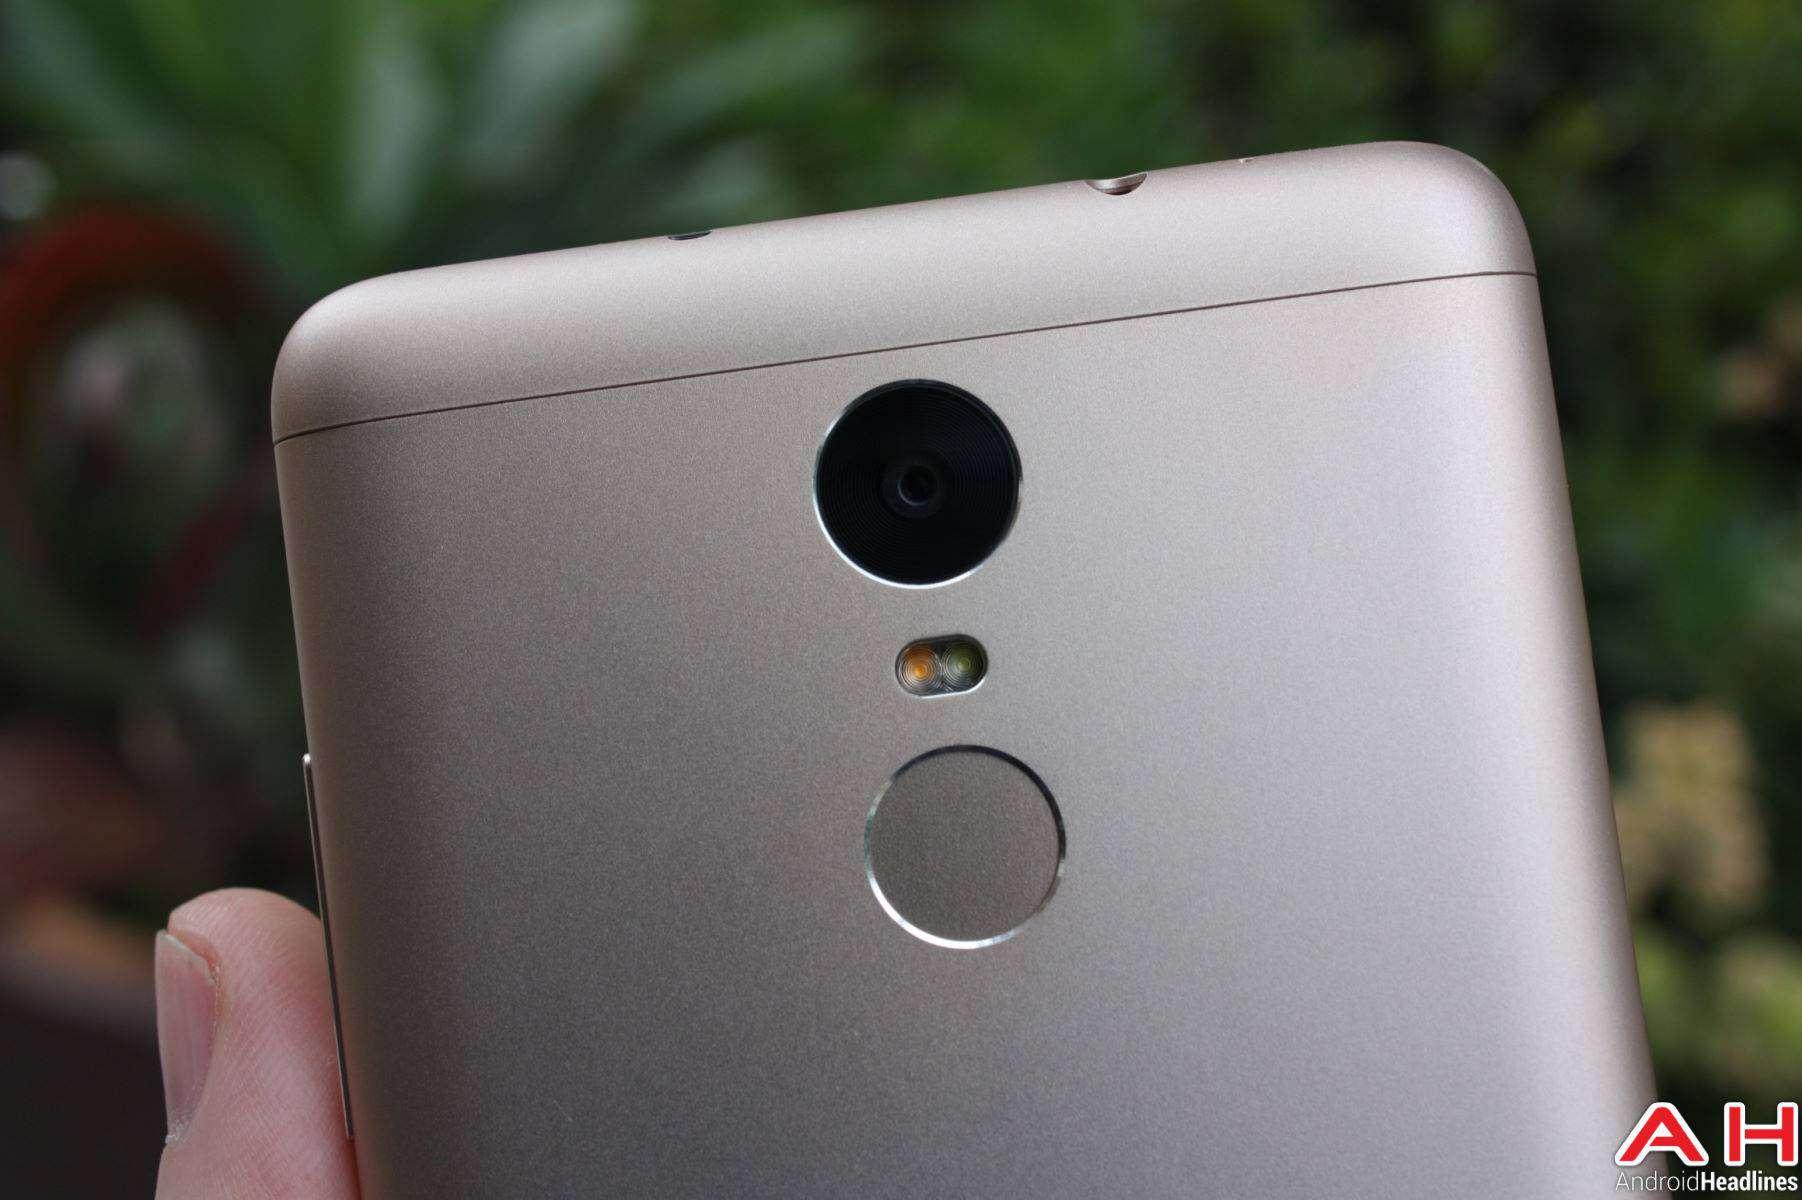 Xiaomi Redmi Note 3 Fingerprint AH-1